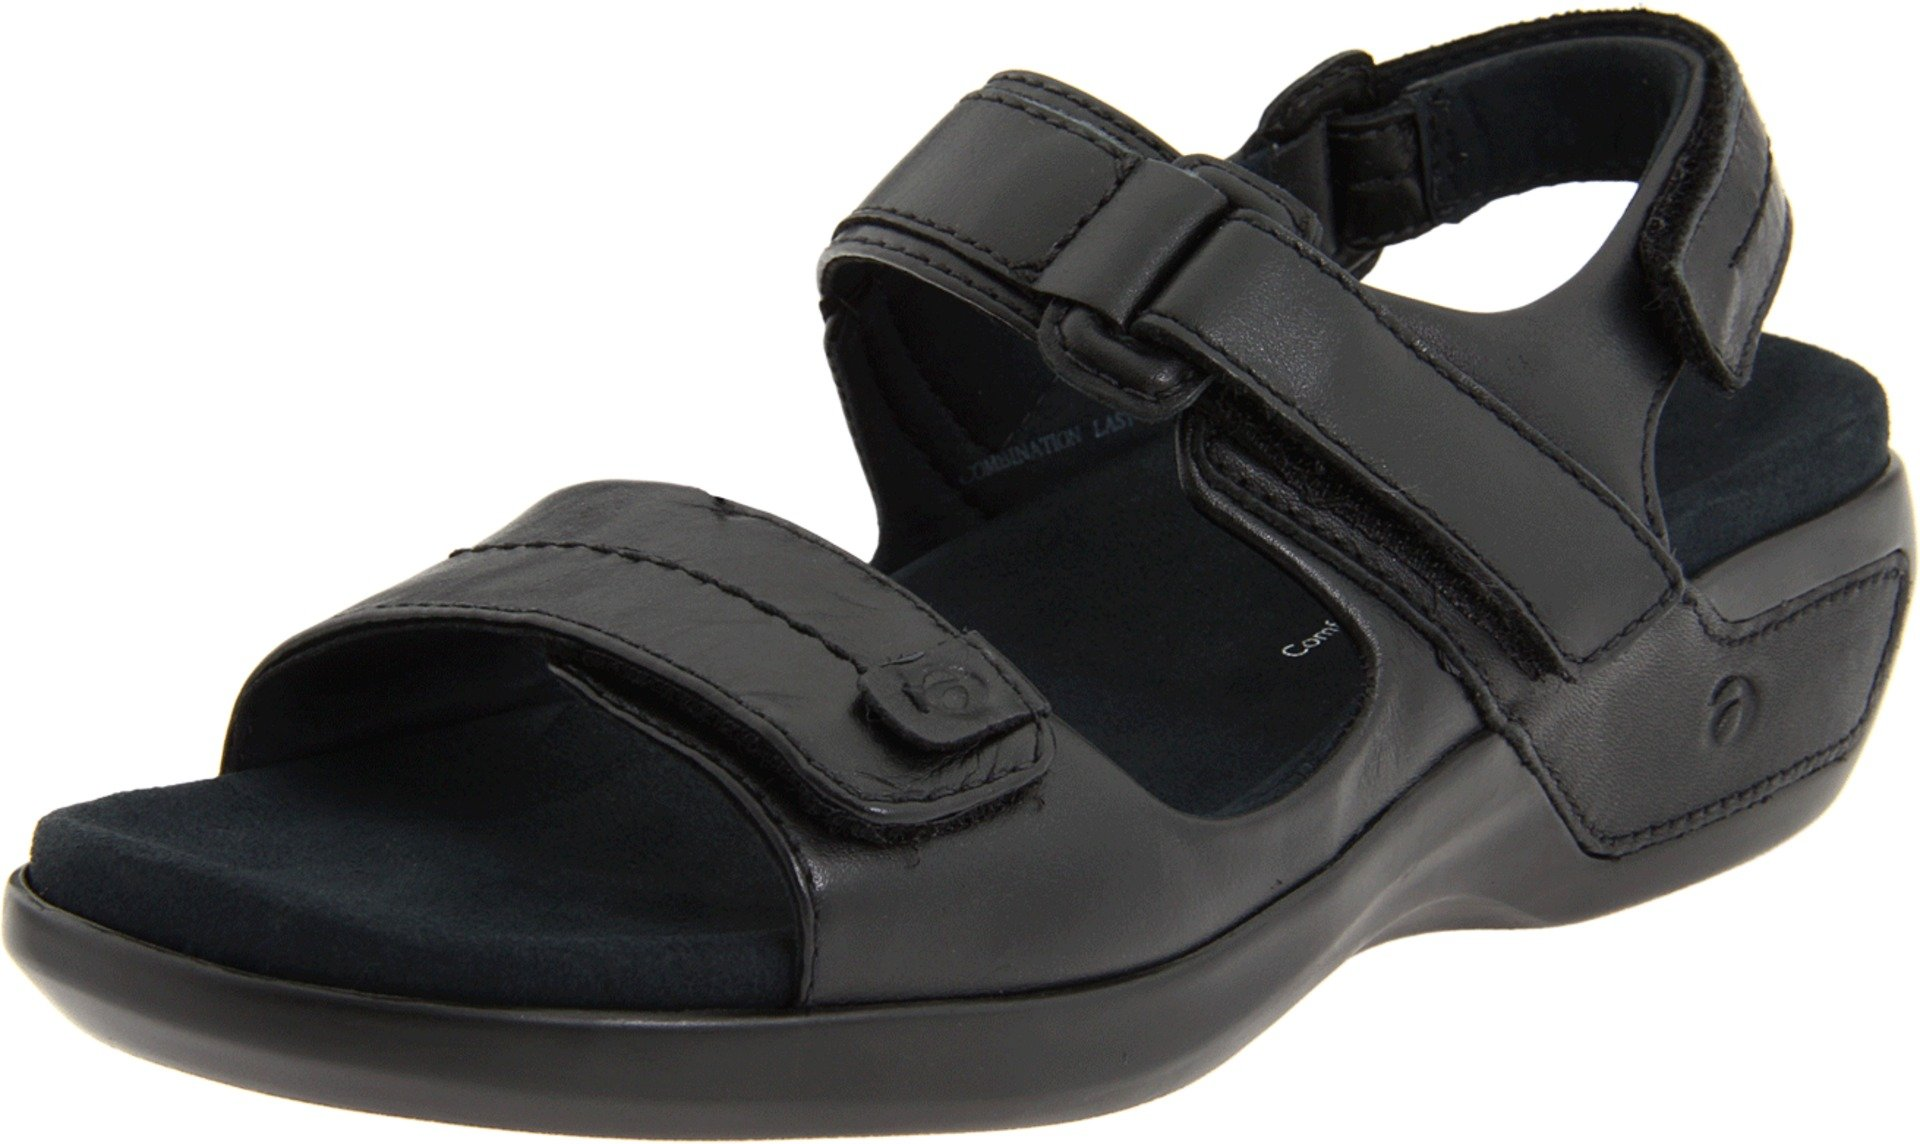 Aravon Womens Katy,Black Leather,11 M (B) US by Aravon